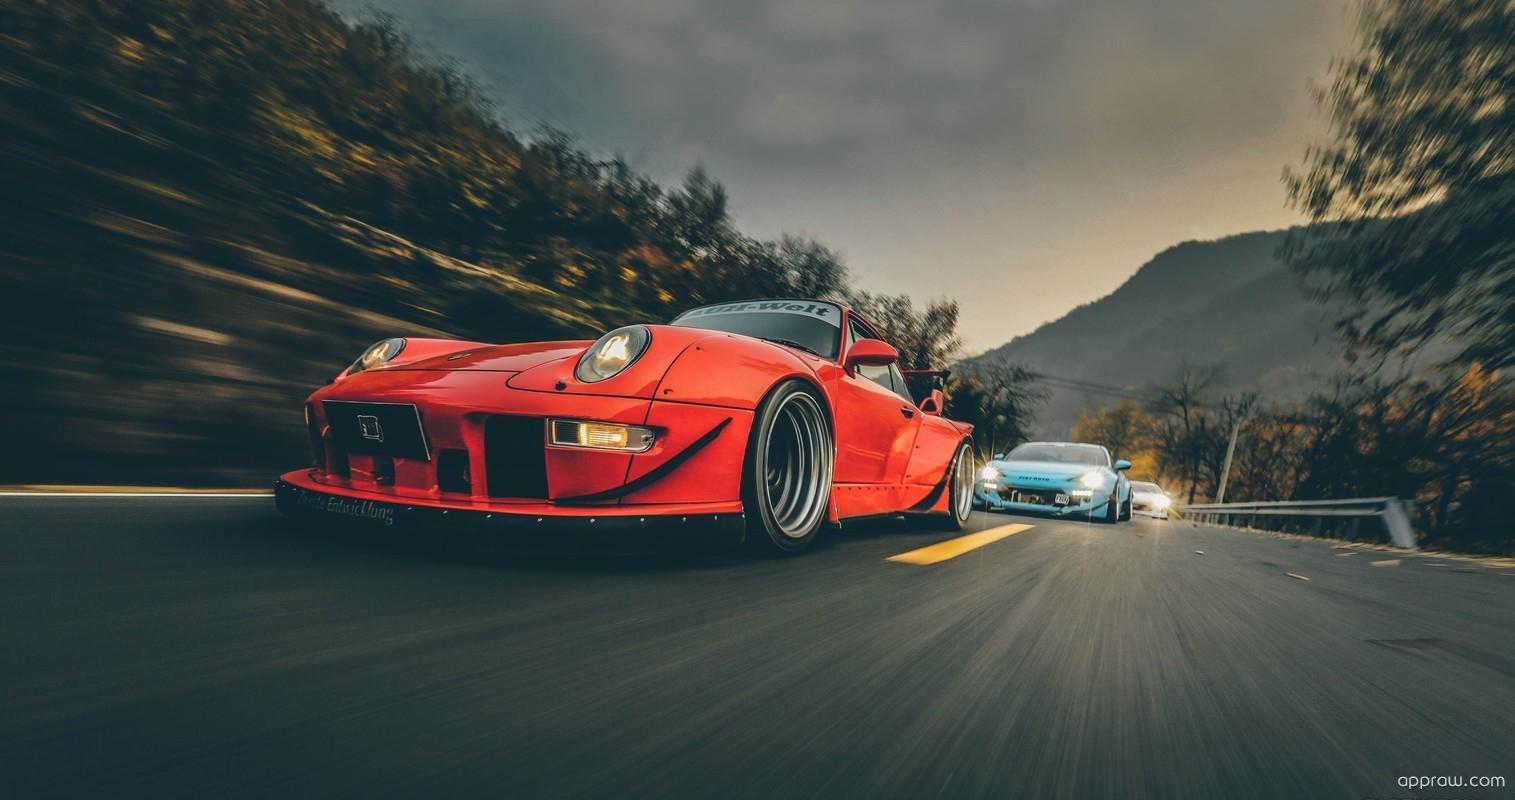 Racing Cars Full Live Wallpaper Apk Porsche 911 993 Wallpaper Download Porsche Hd